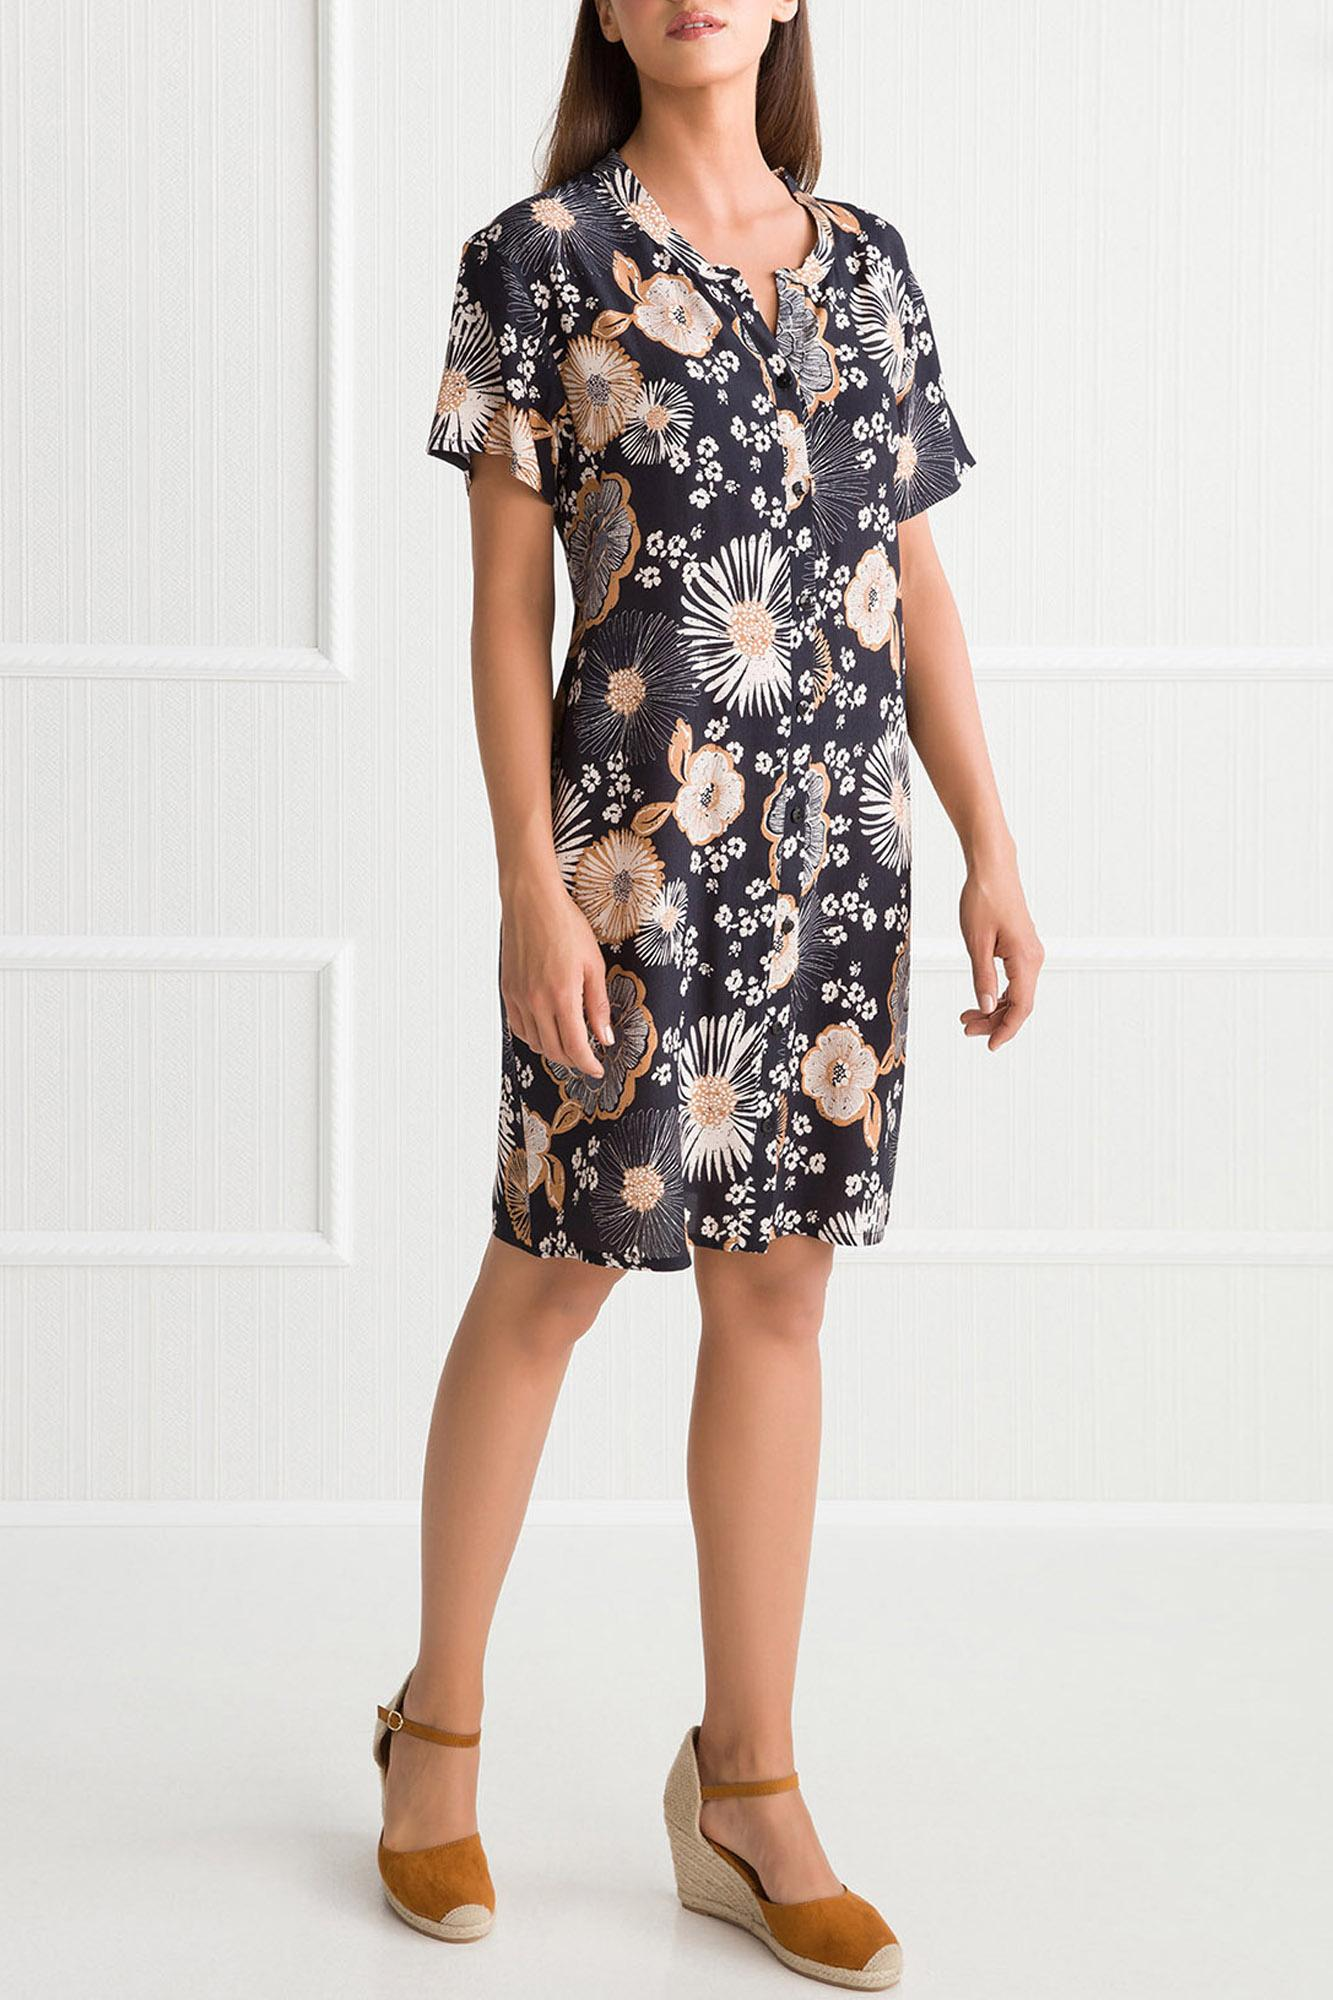 Dark Printed Buttoned Dress